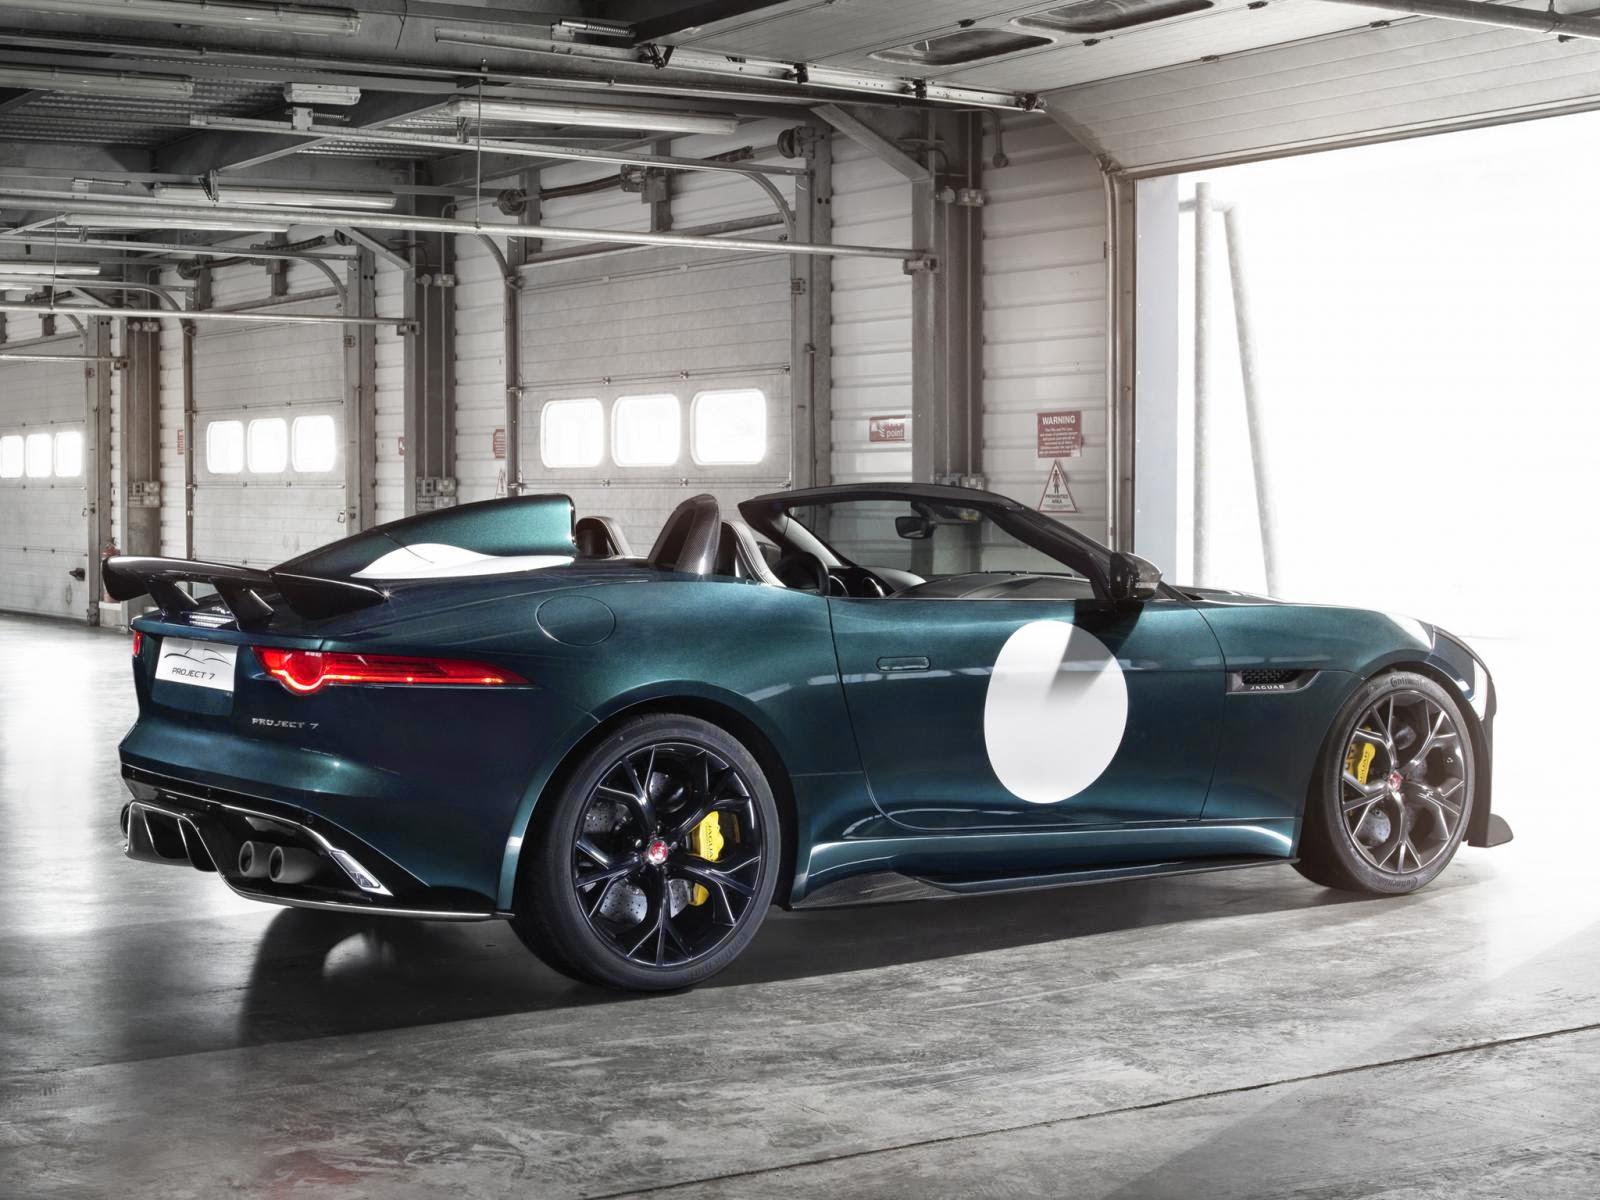 [Resim: Jaguar+Project+7+2.jpg]